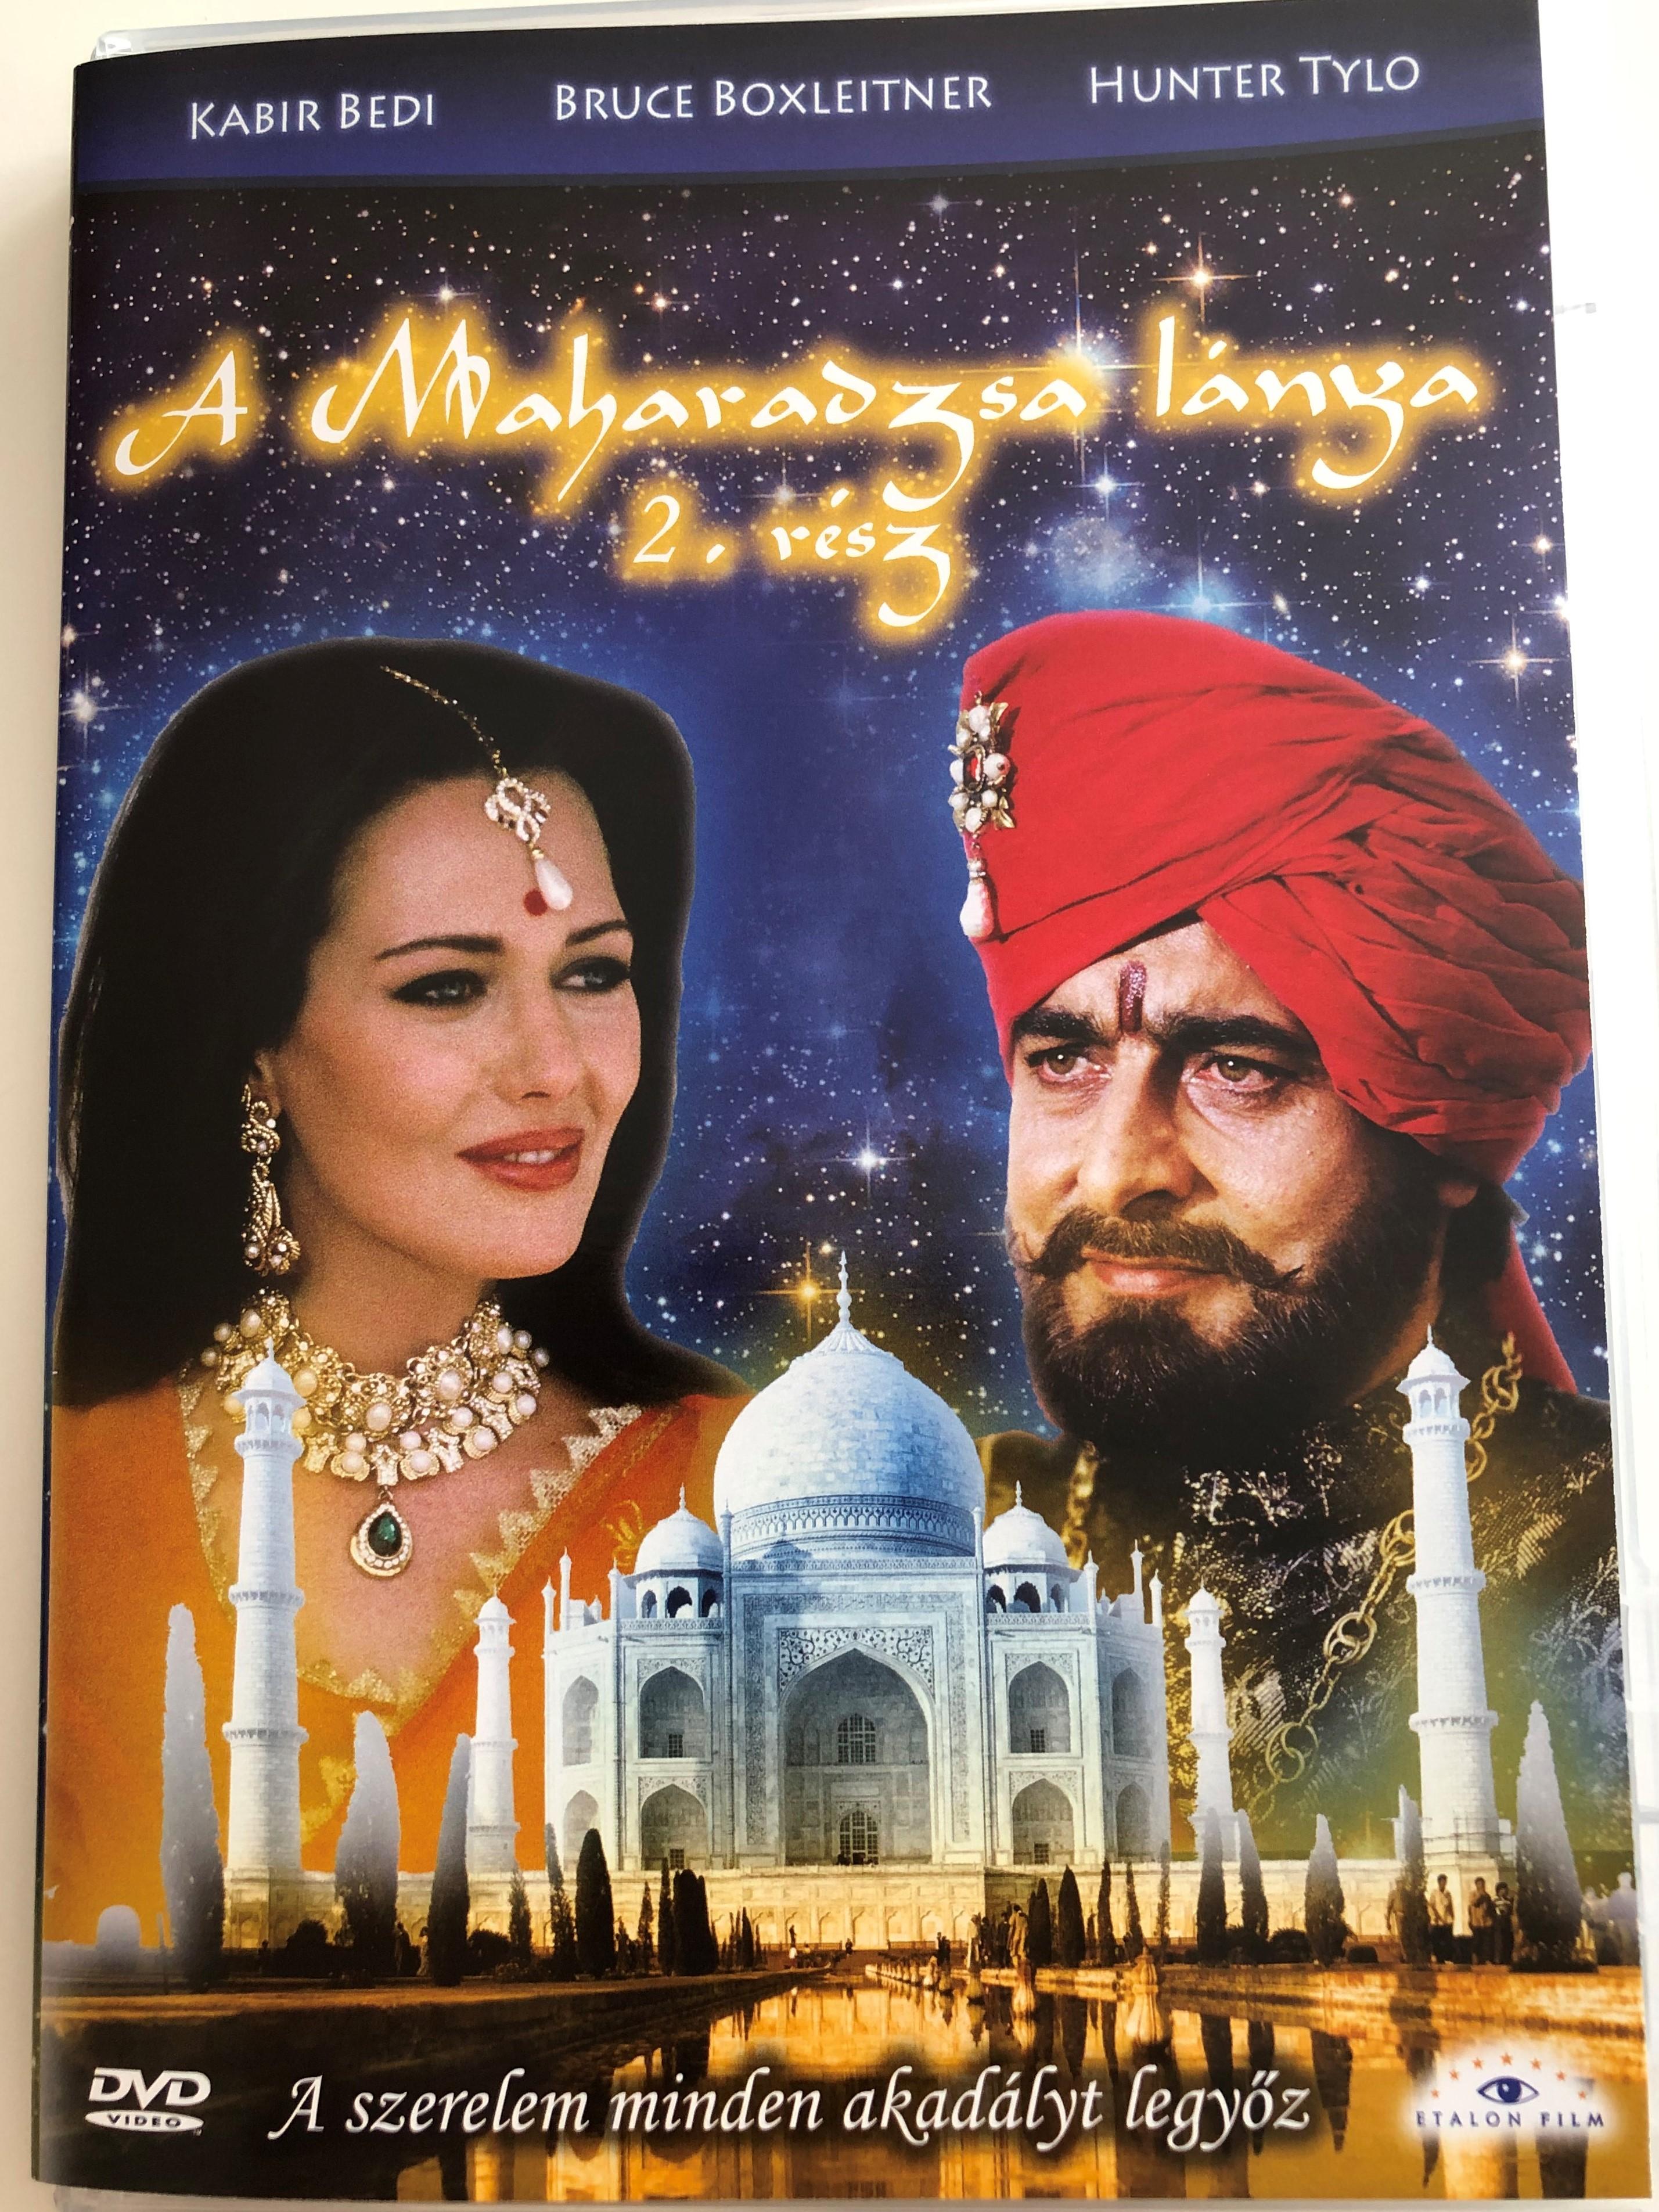 the-maharaja-s-daughter-2.-dvd-1994-a-maharadzsa-l-nya-2.-r-sz-directed-by-burt-brinckerhoff-starring-kabir-bedi-bruce-boxleitner-hunter-tylo-mini-series-1-.jpg